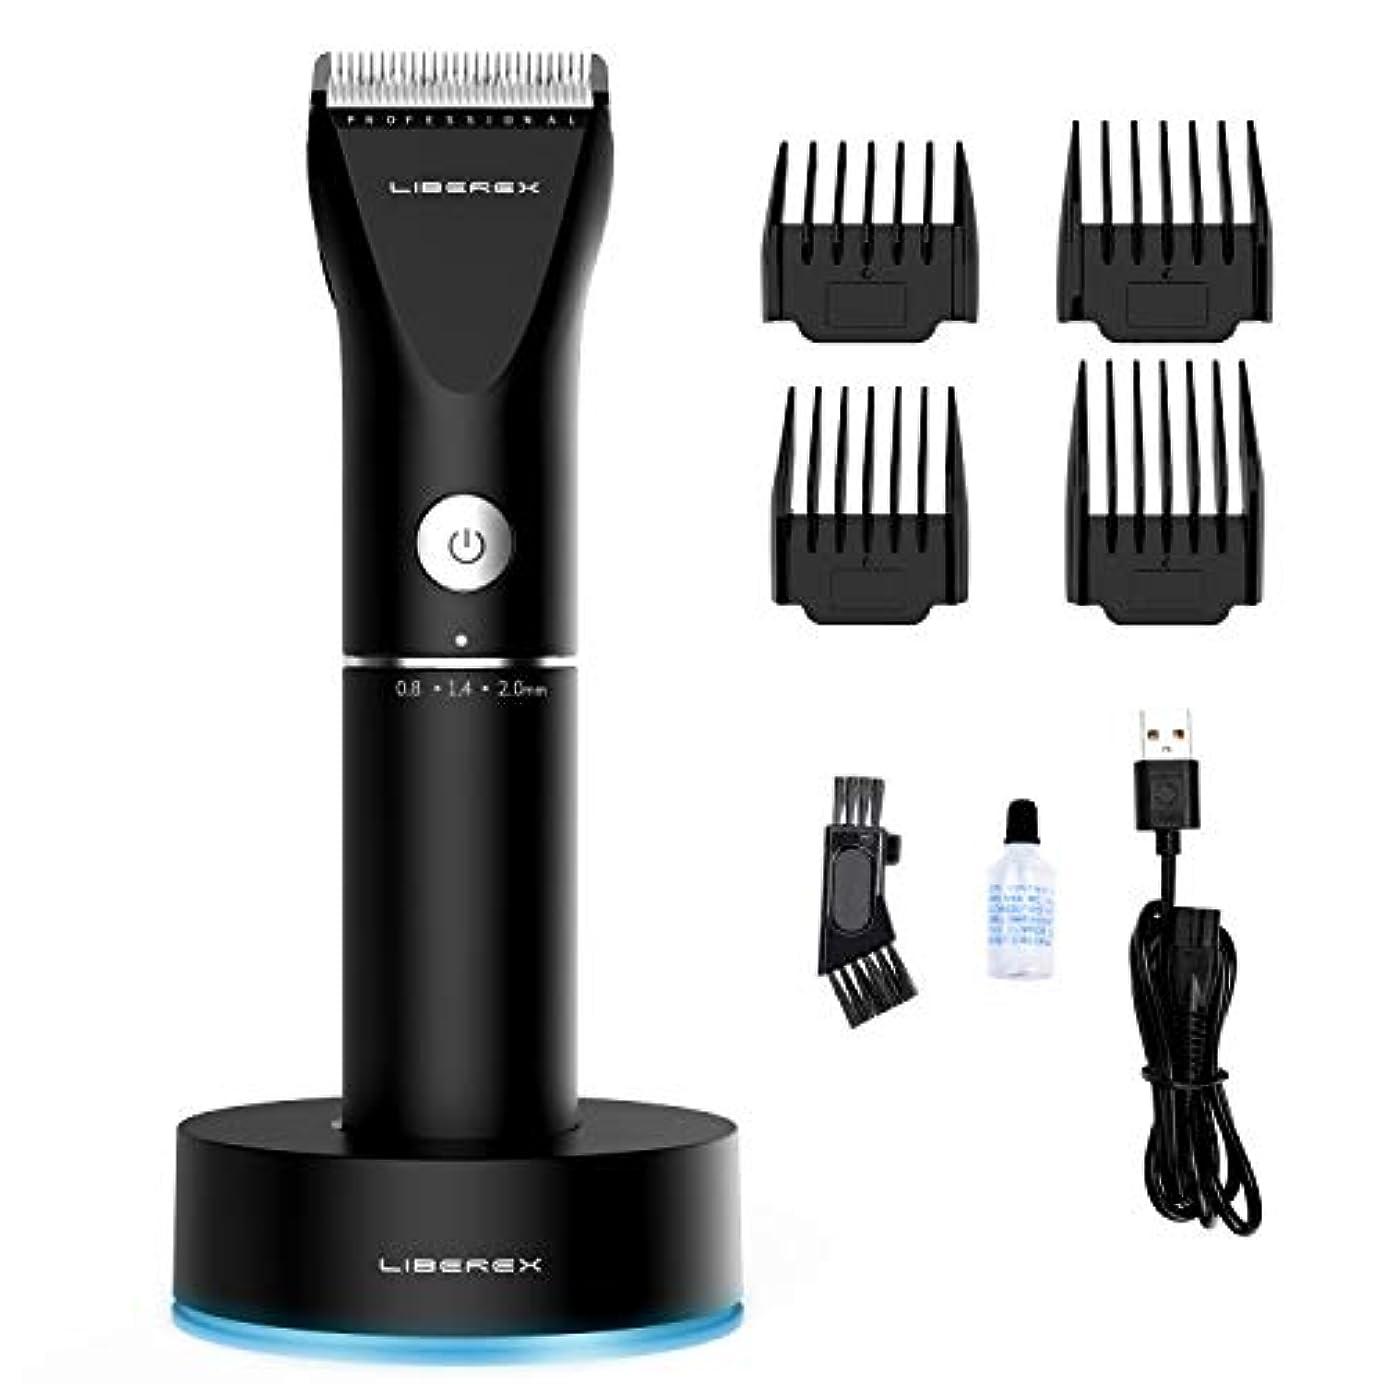 Liberex バリカン 電動バリカン 電気バリカン 散髪バリカン ヘアカッター 家庭用 業務 子供 長さ調整 0.8mm~2.0mm 2段階スピード調節 USB充電 防水 低騒音 ブラック 一年保証